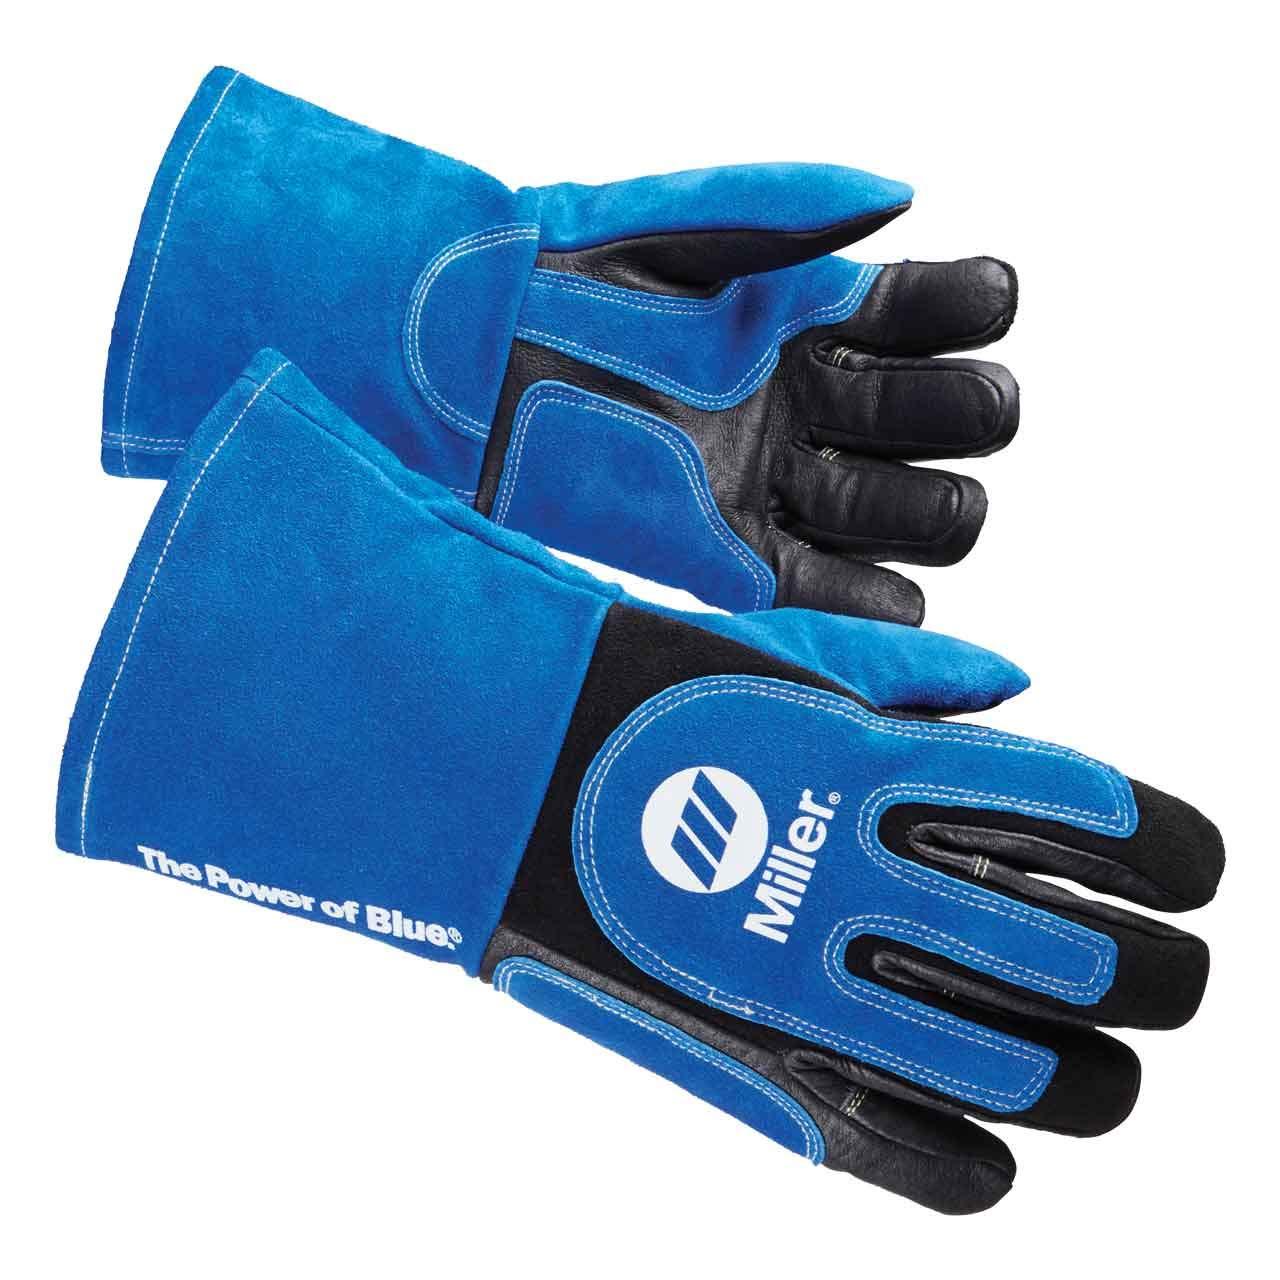 Miller 269615 Heavy Duty MIG//Stick Welding Glove 2X-Large